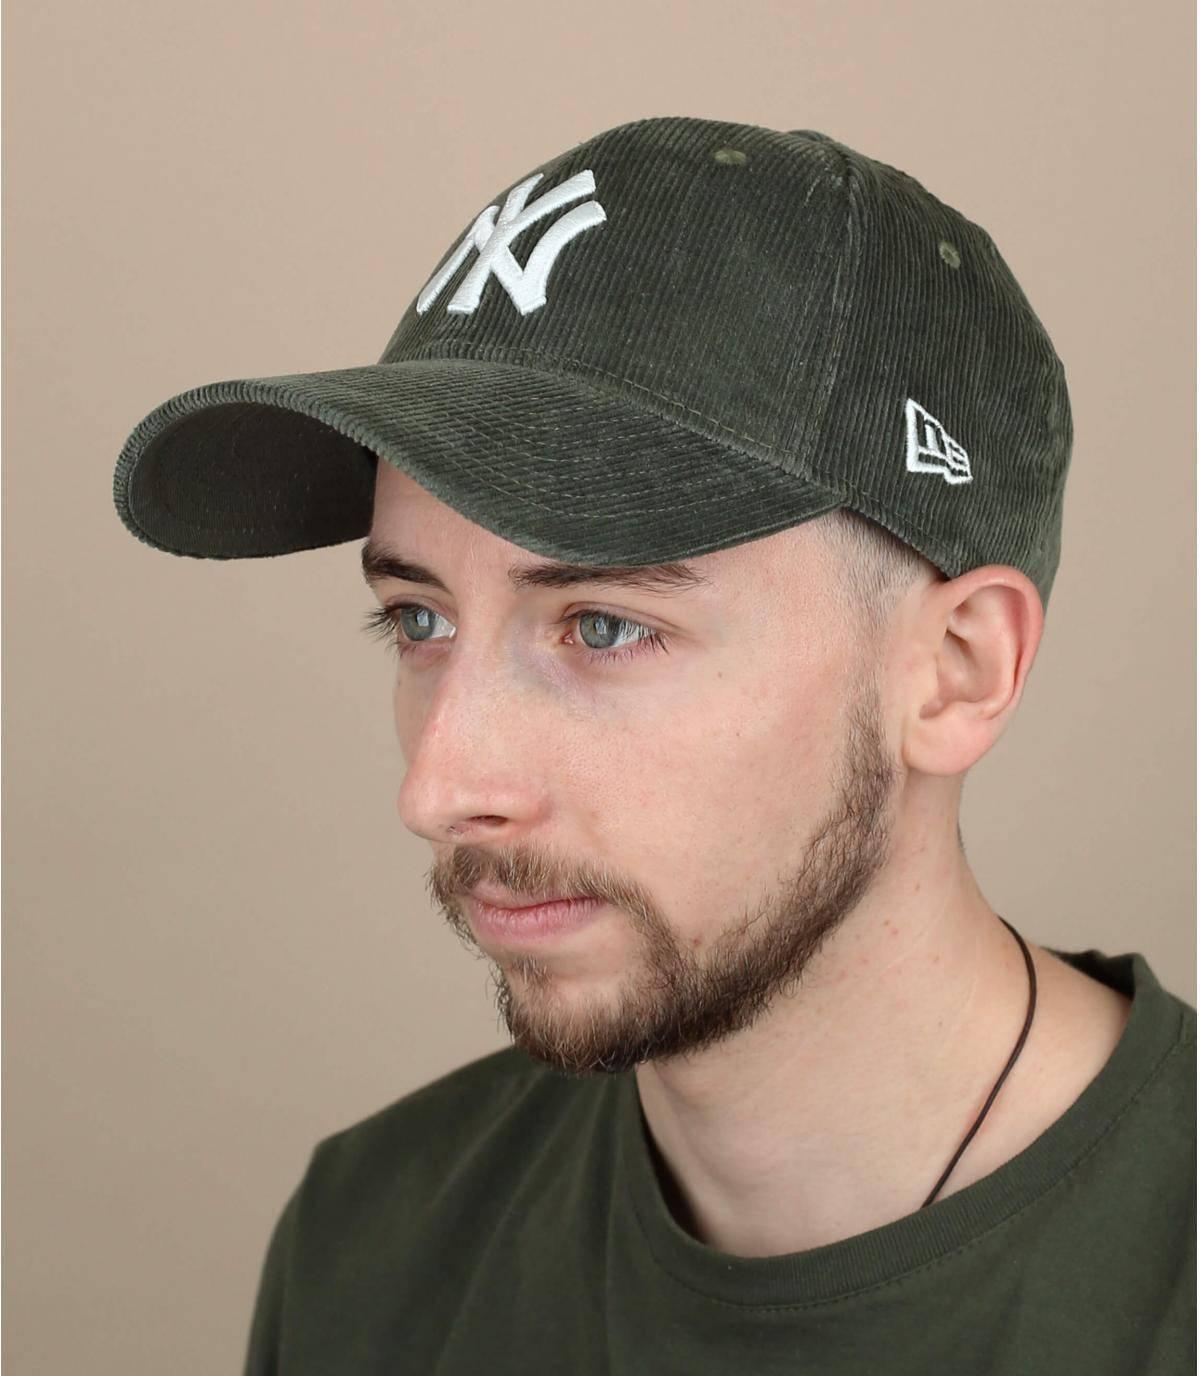 groen fluwelen cap